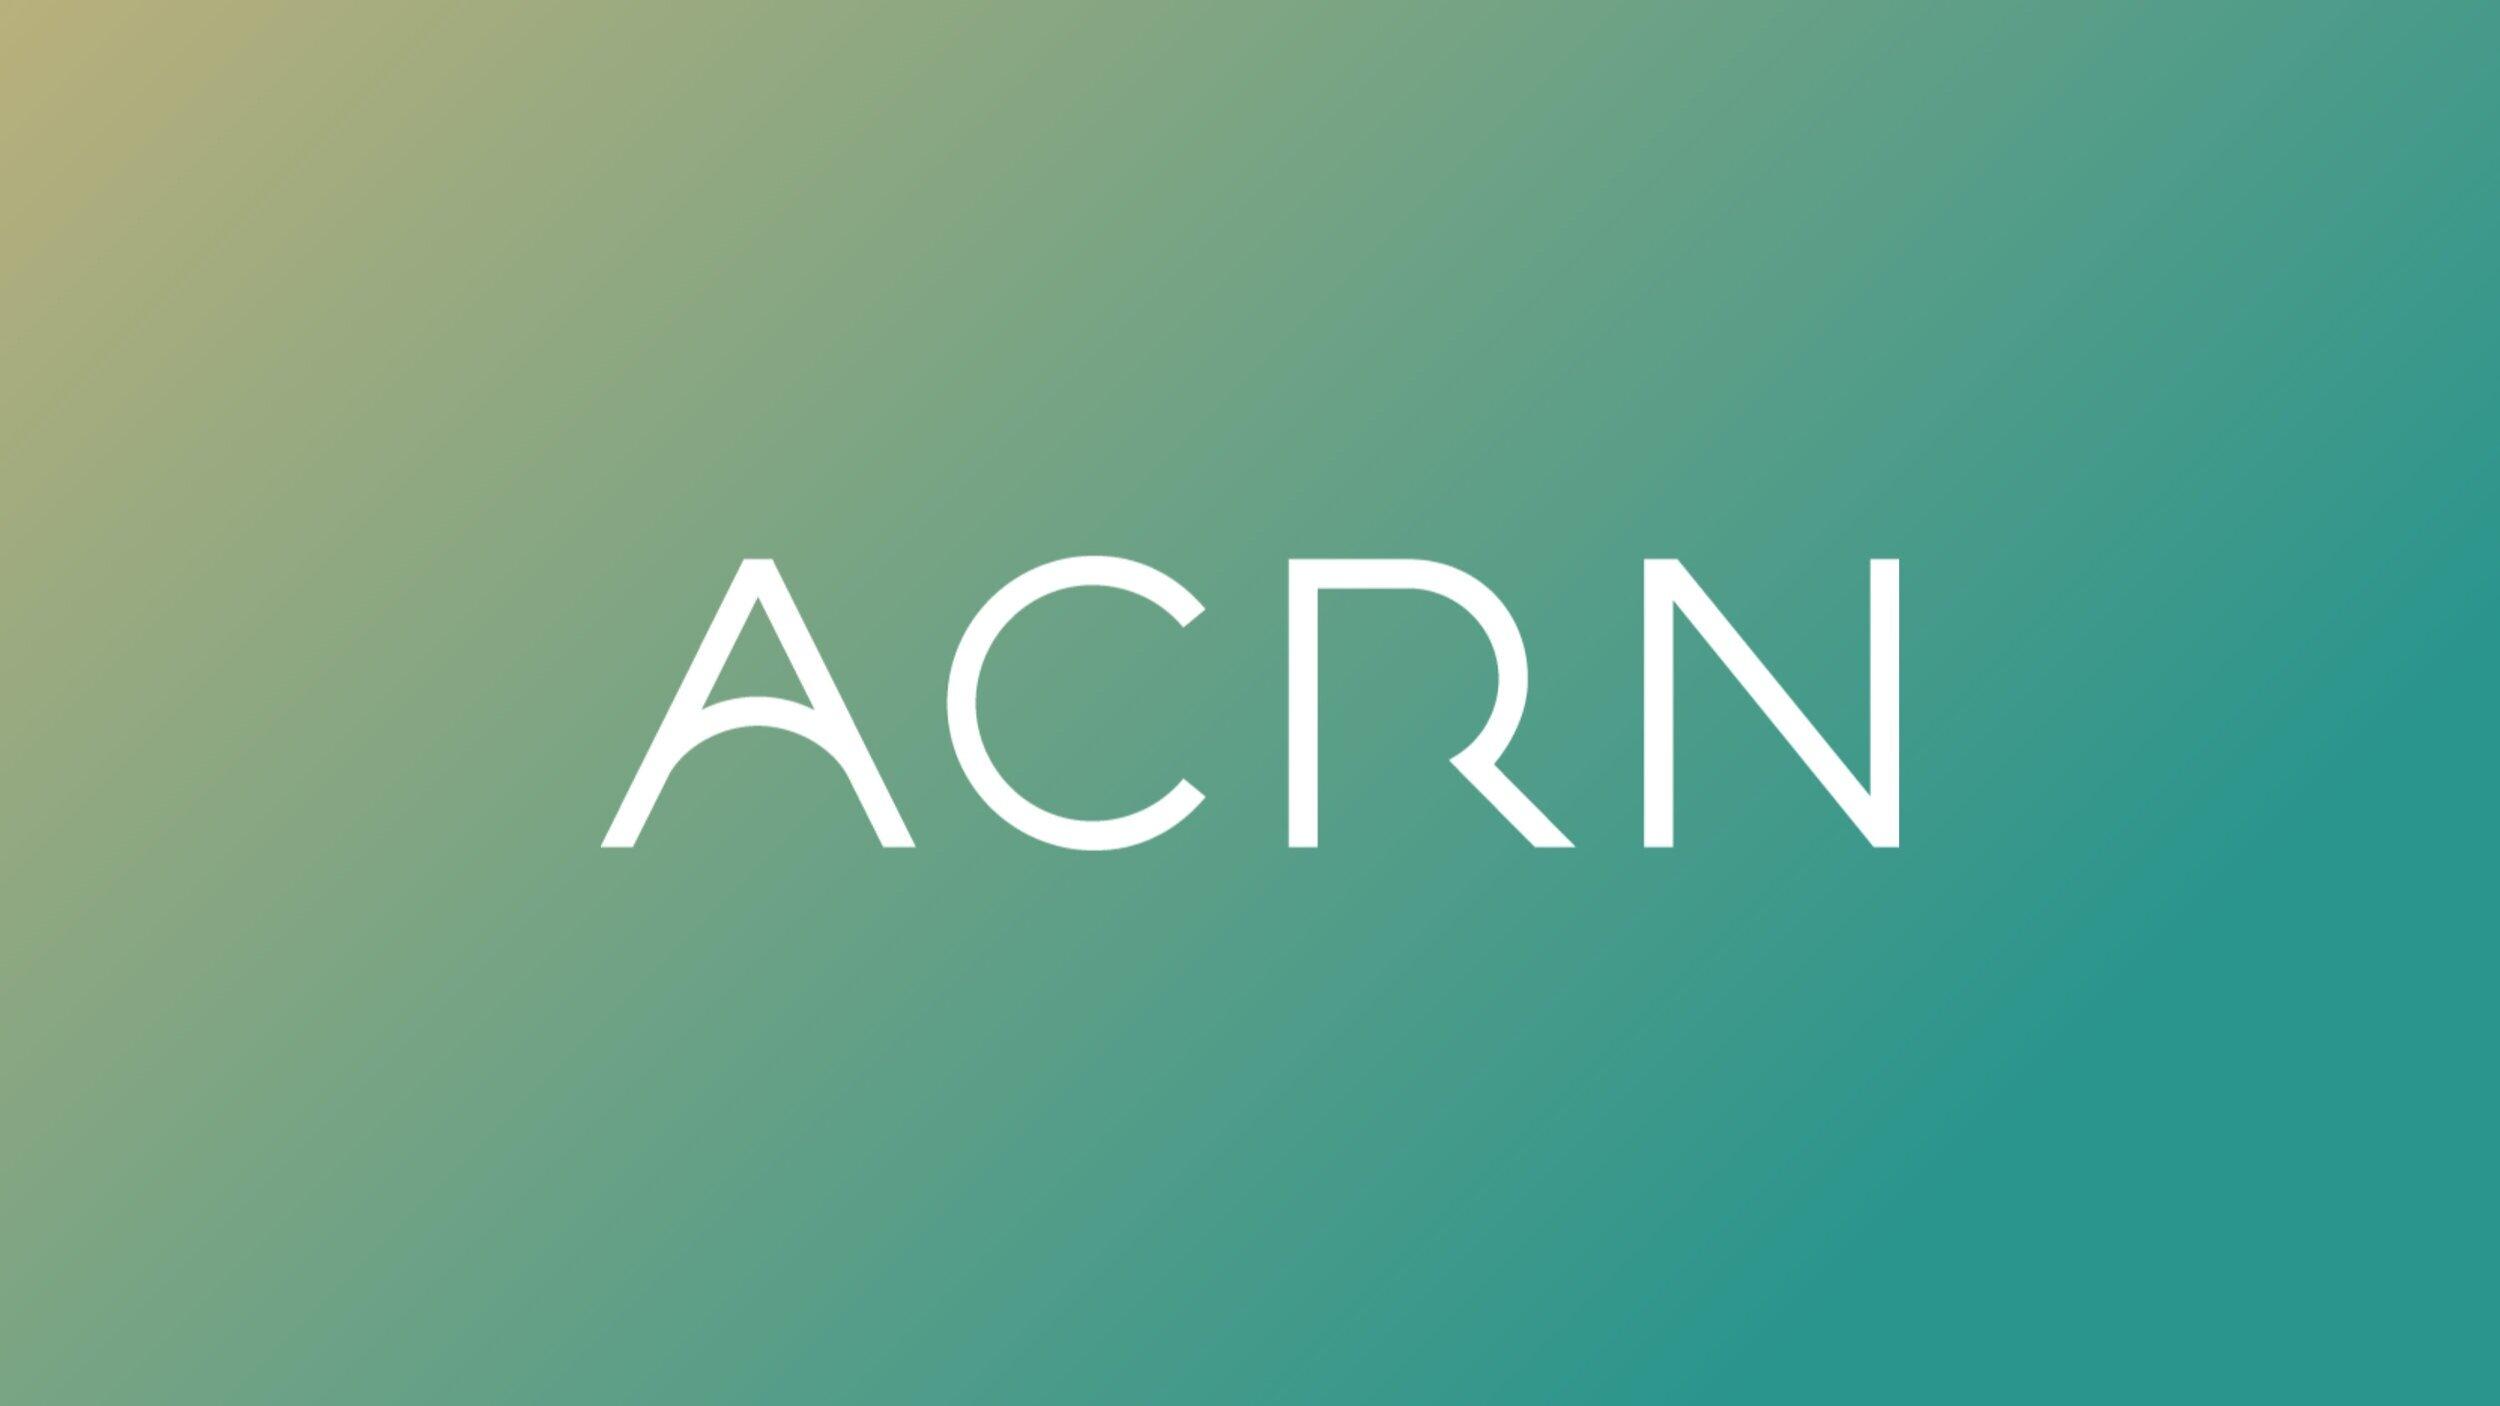 ACRN  | Naming - Identity - Deck Design